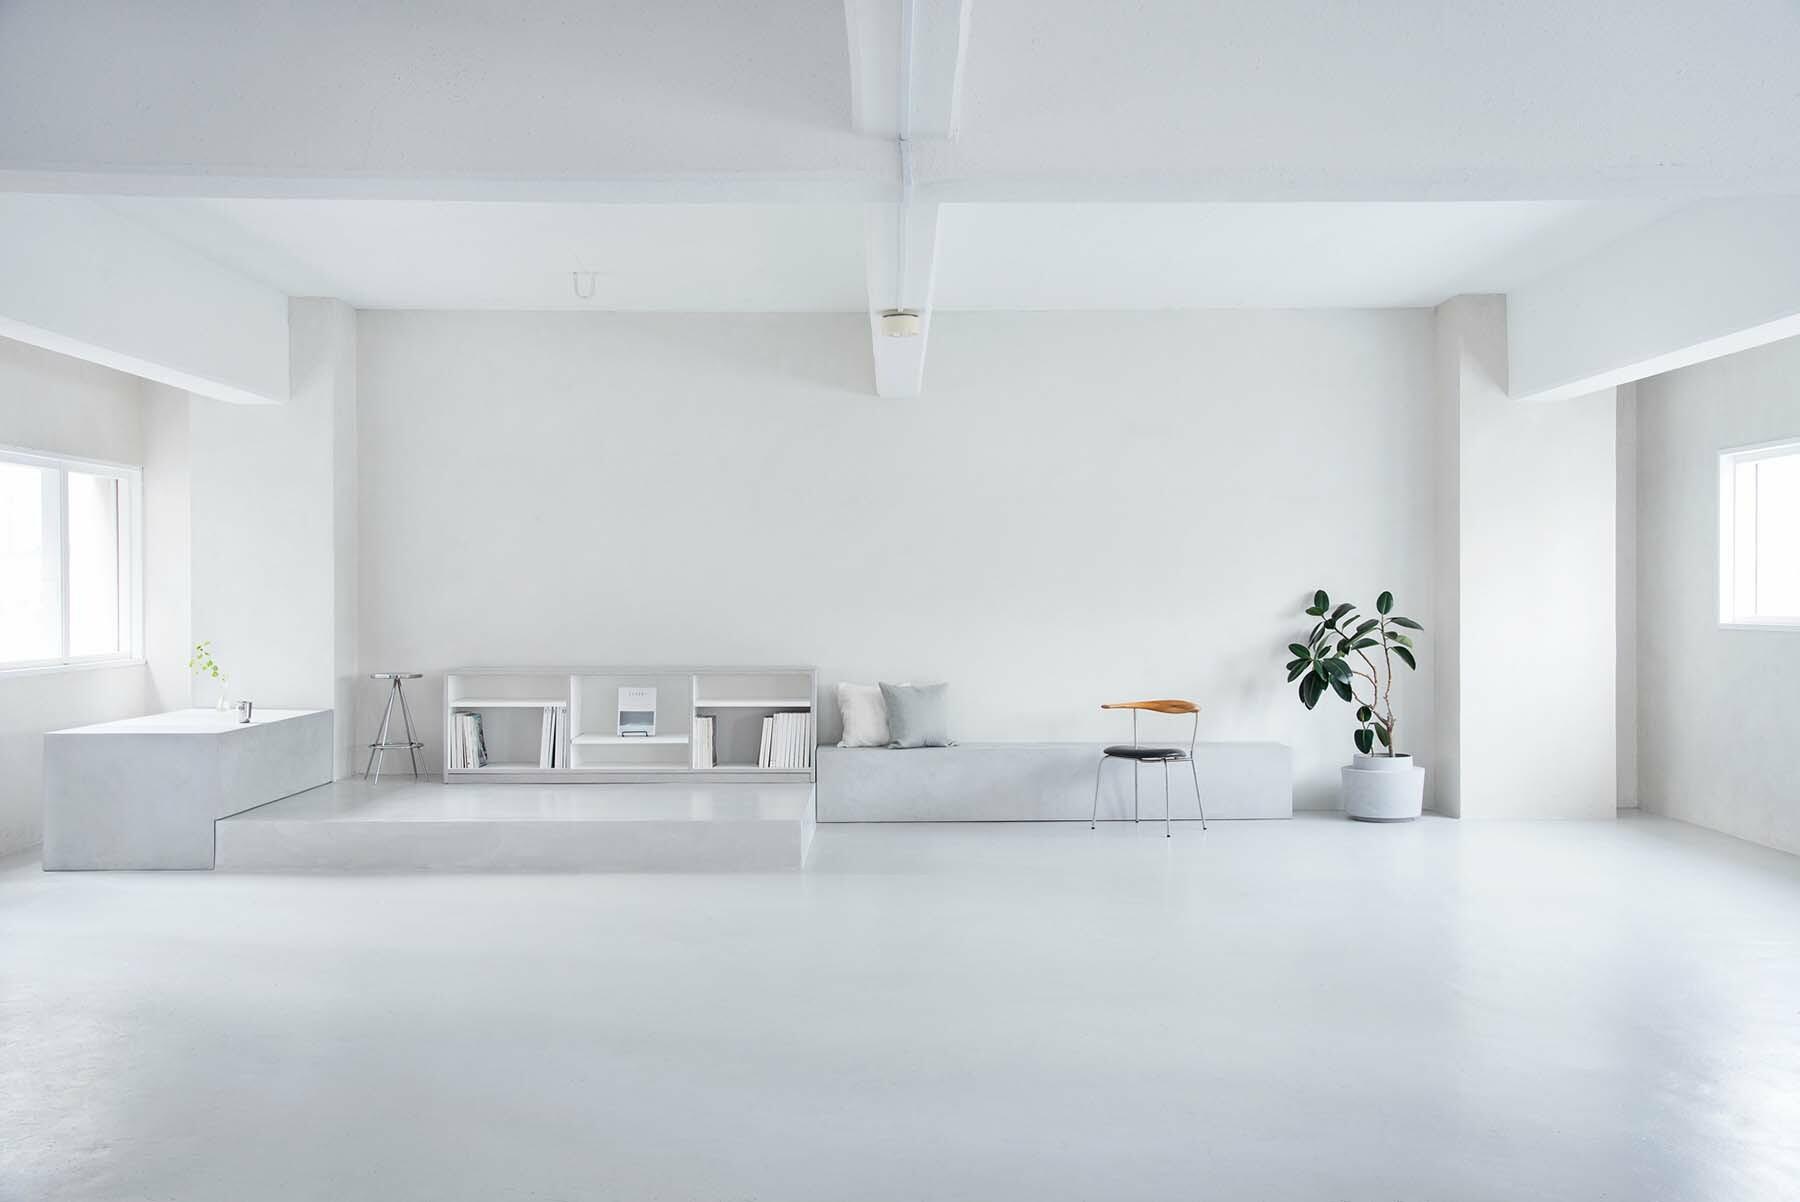 StudioBRICK 2F (スタジオブリック八丁堀2F)白壁と黒床のコントラスト